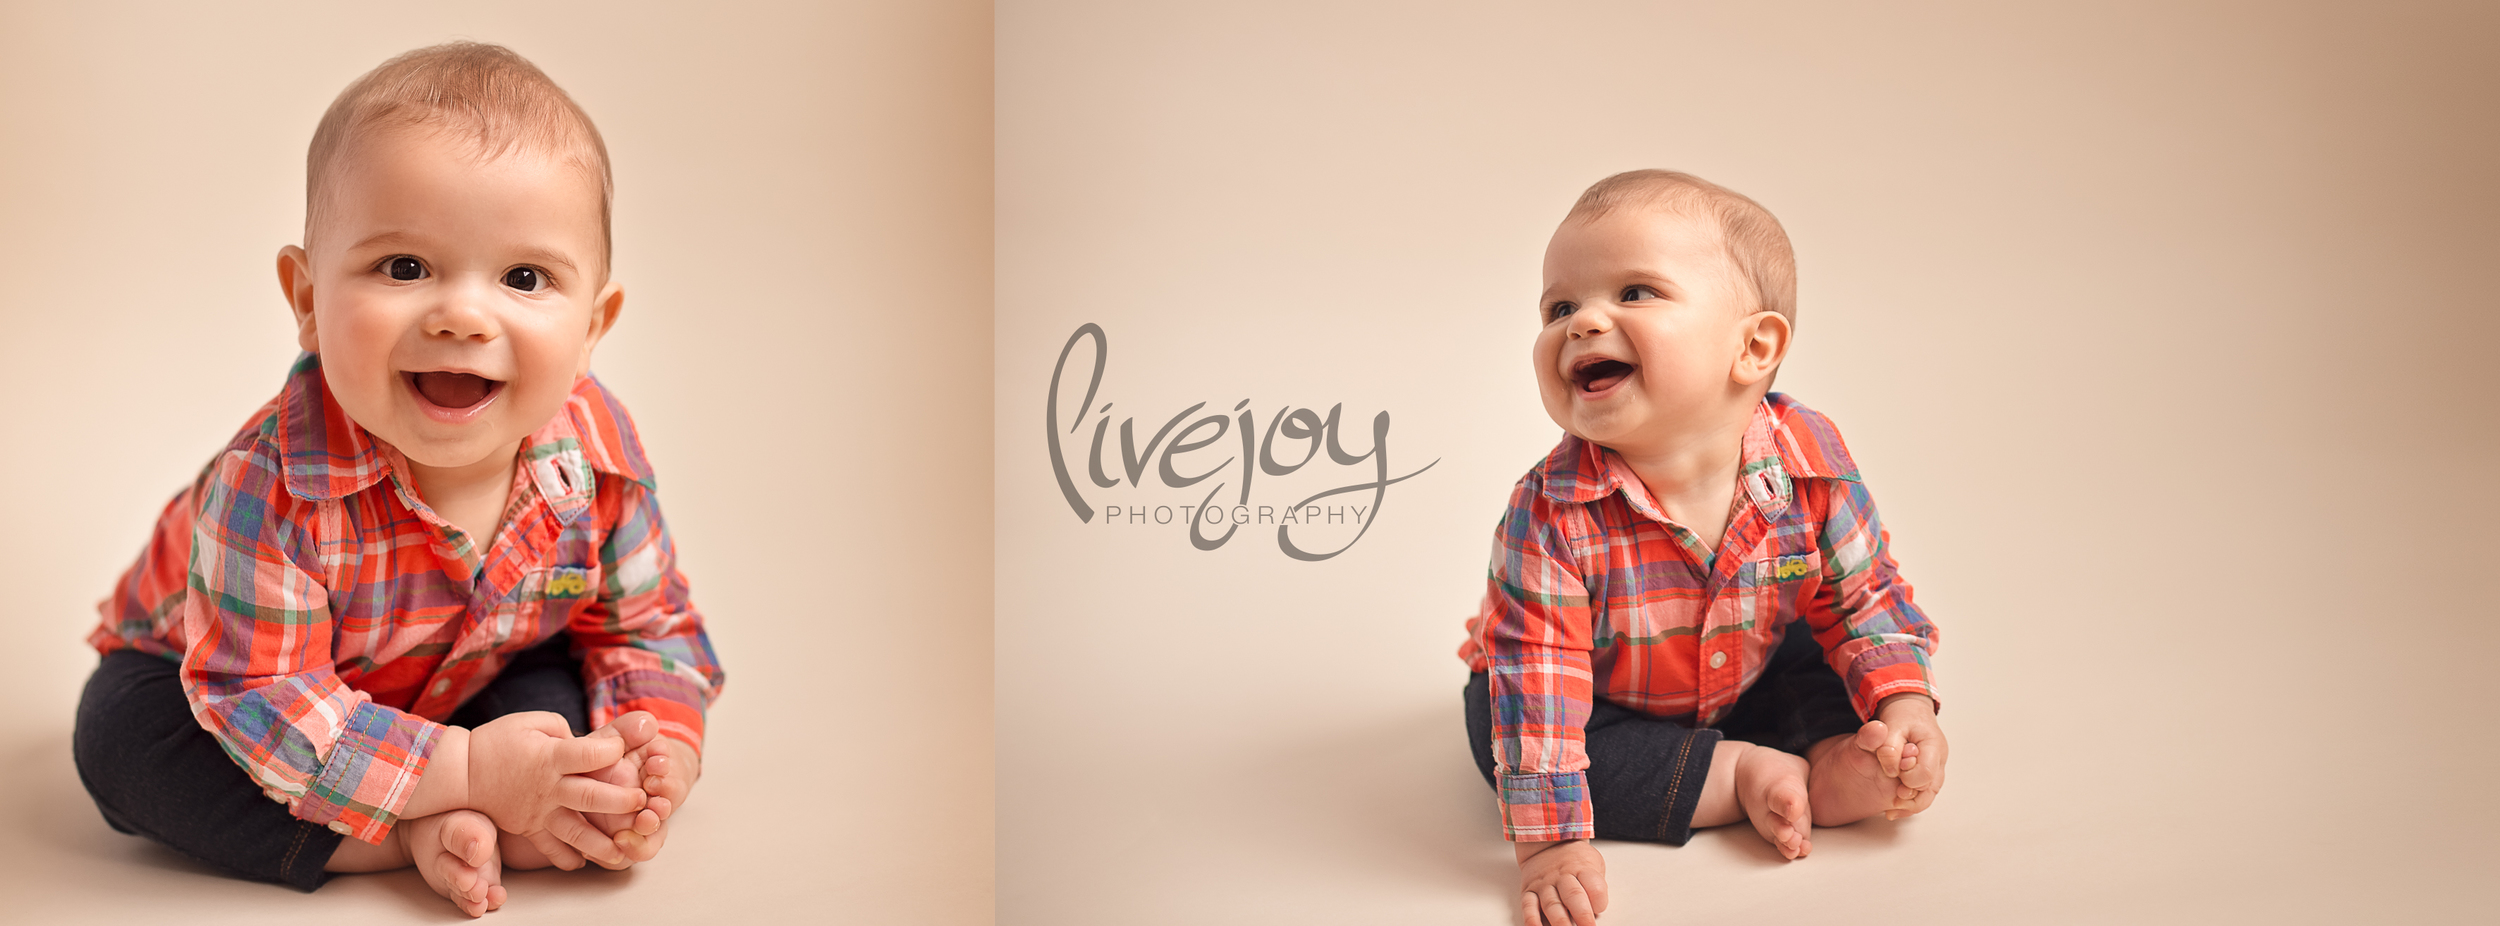 6 Month Photography | LiveJoy Photography | Oregon